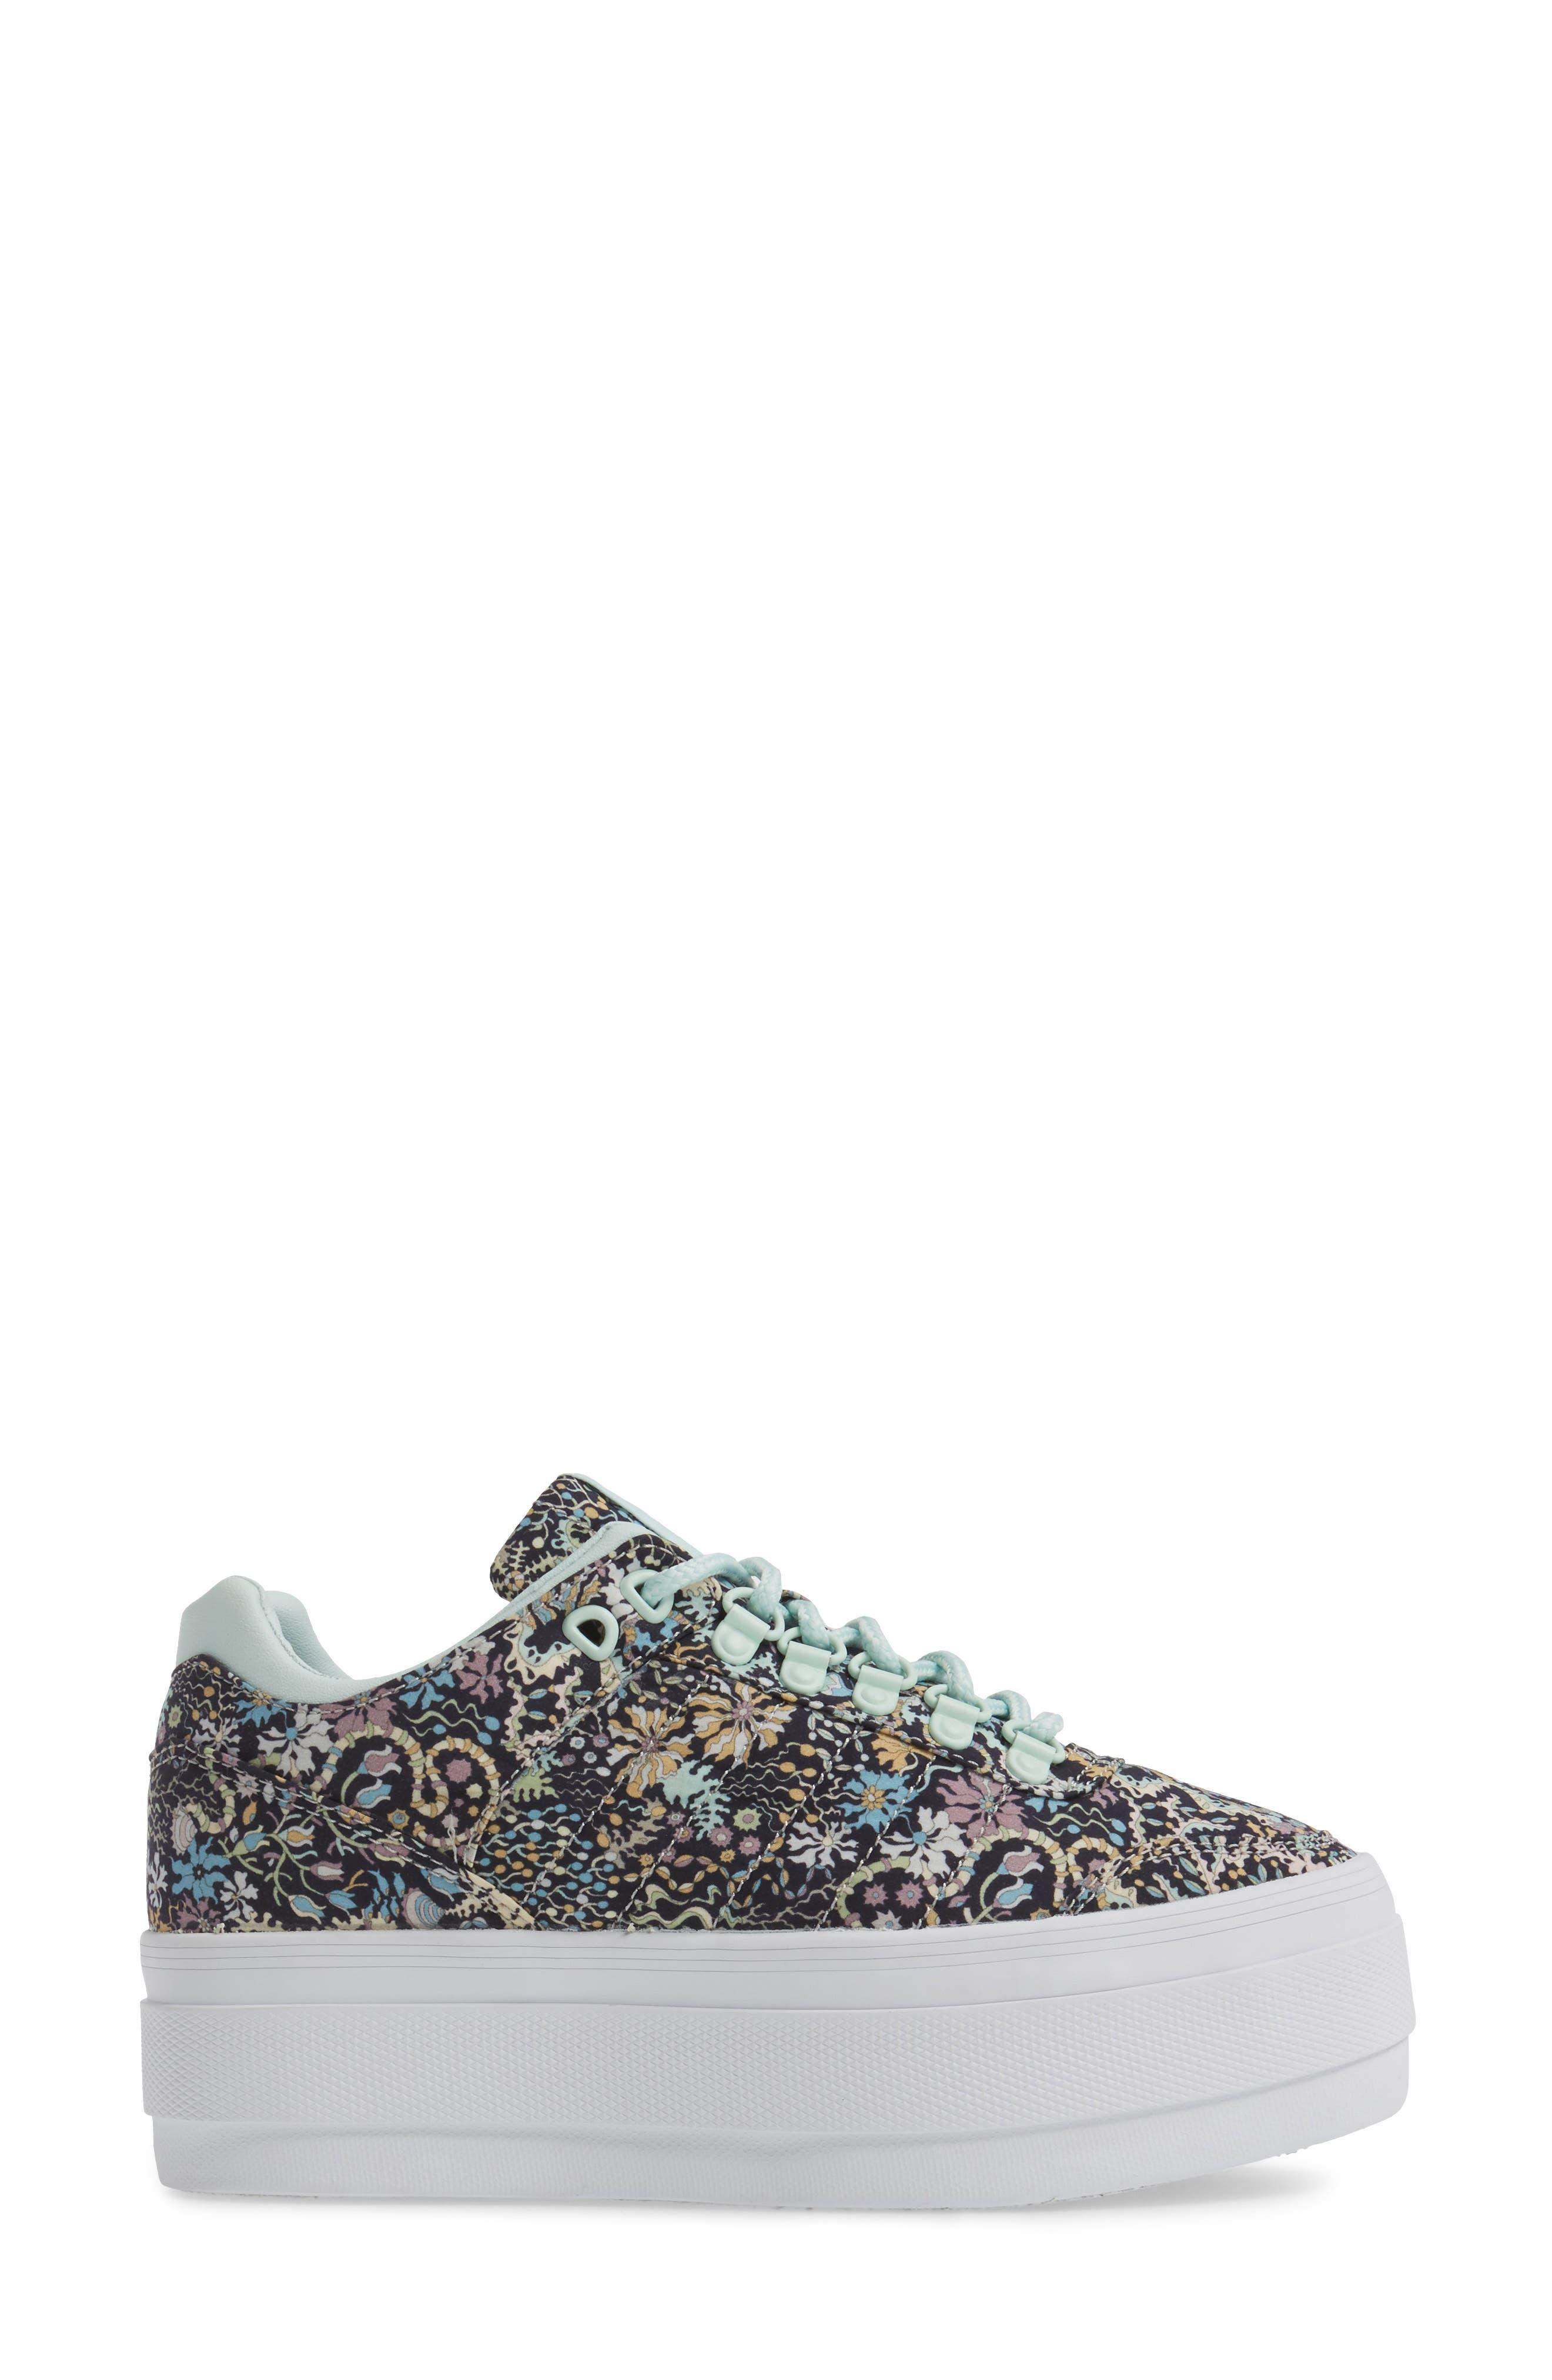 Gstaad Flatform Sneaker,                             Alternate thumbnail 3, color,                             040